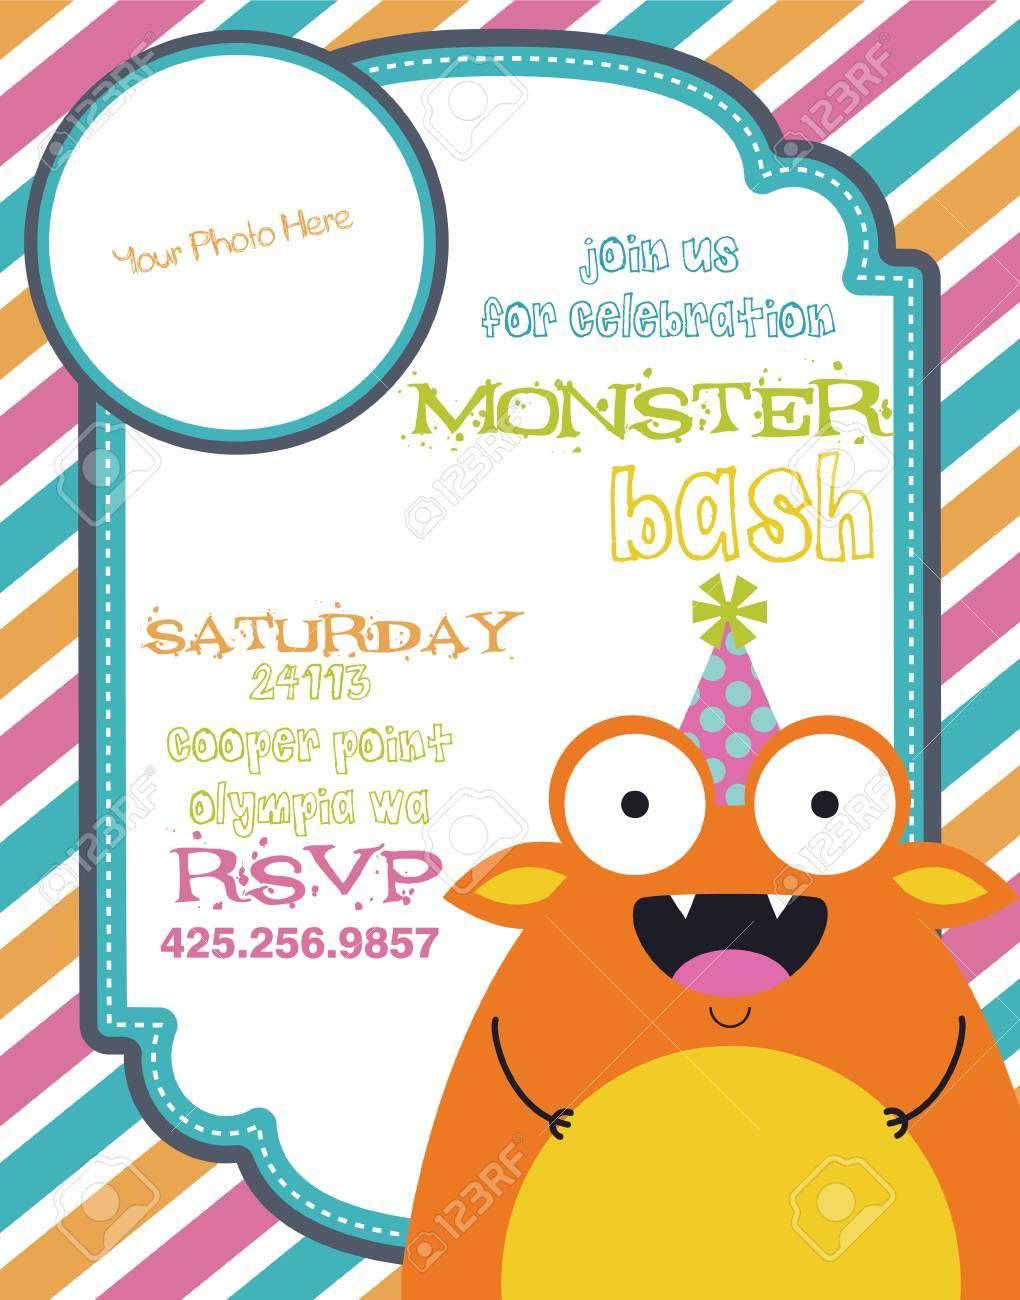 monster party invitation card design. vector illustration Stock Vector - 26906588